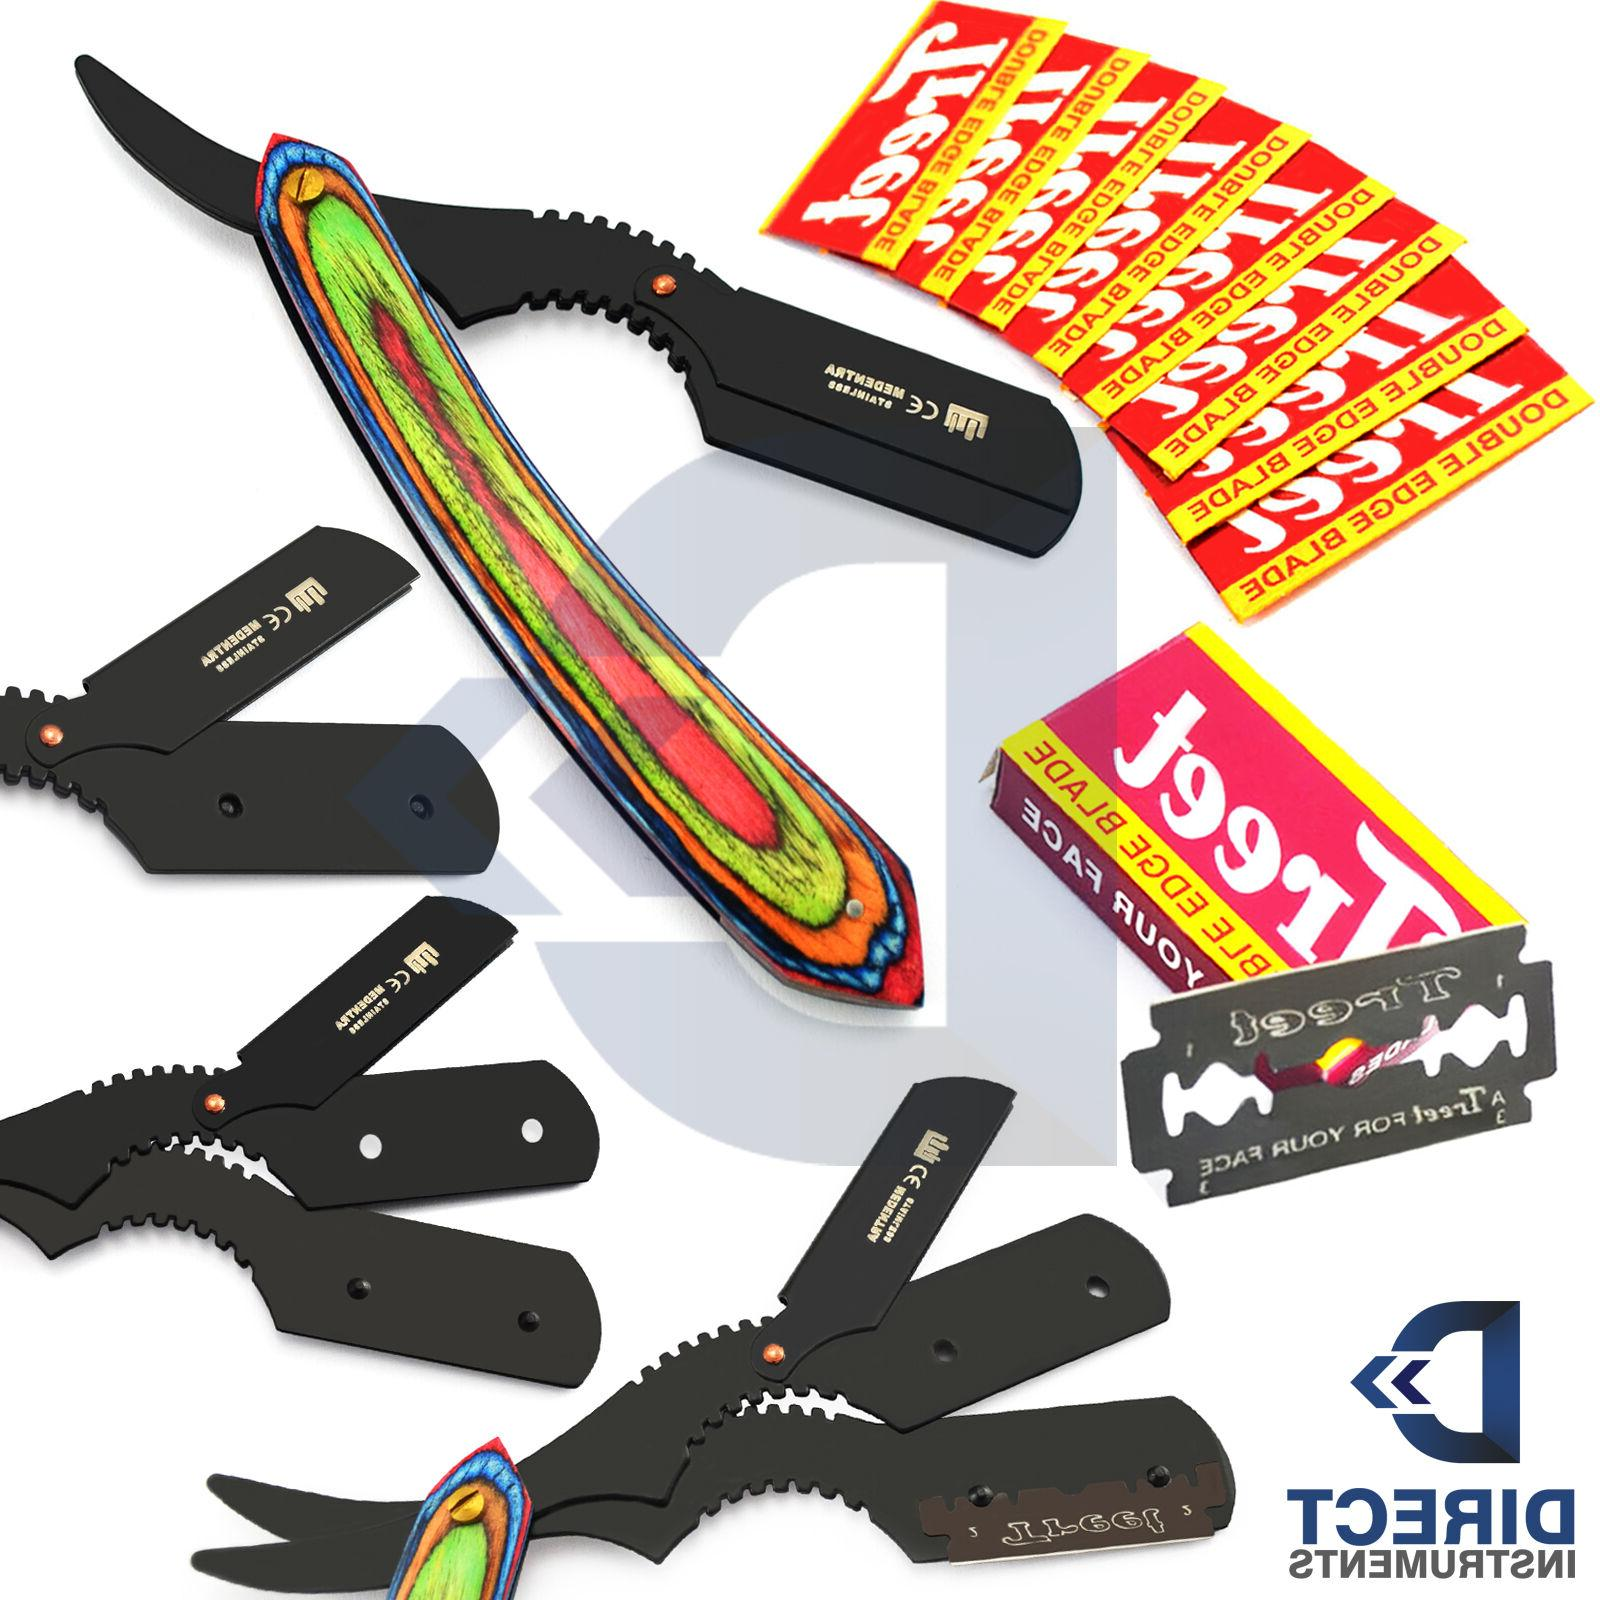 vinatge straight edge folding knife